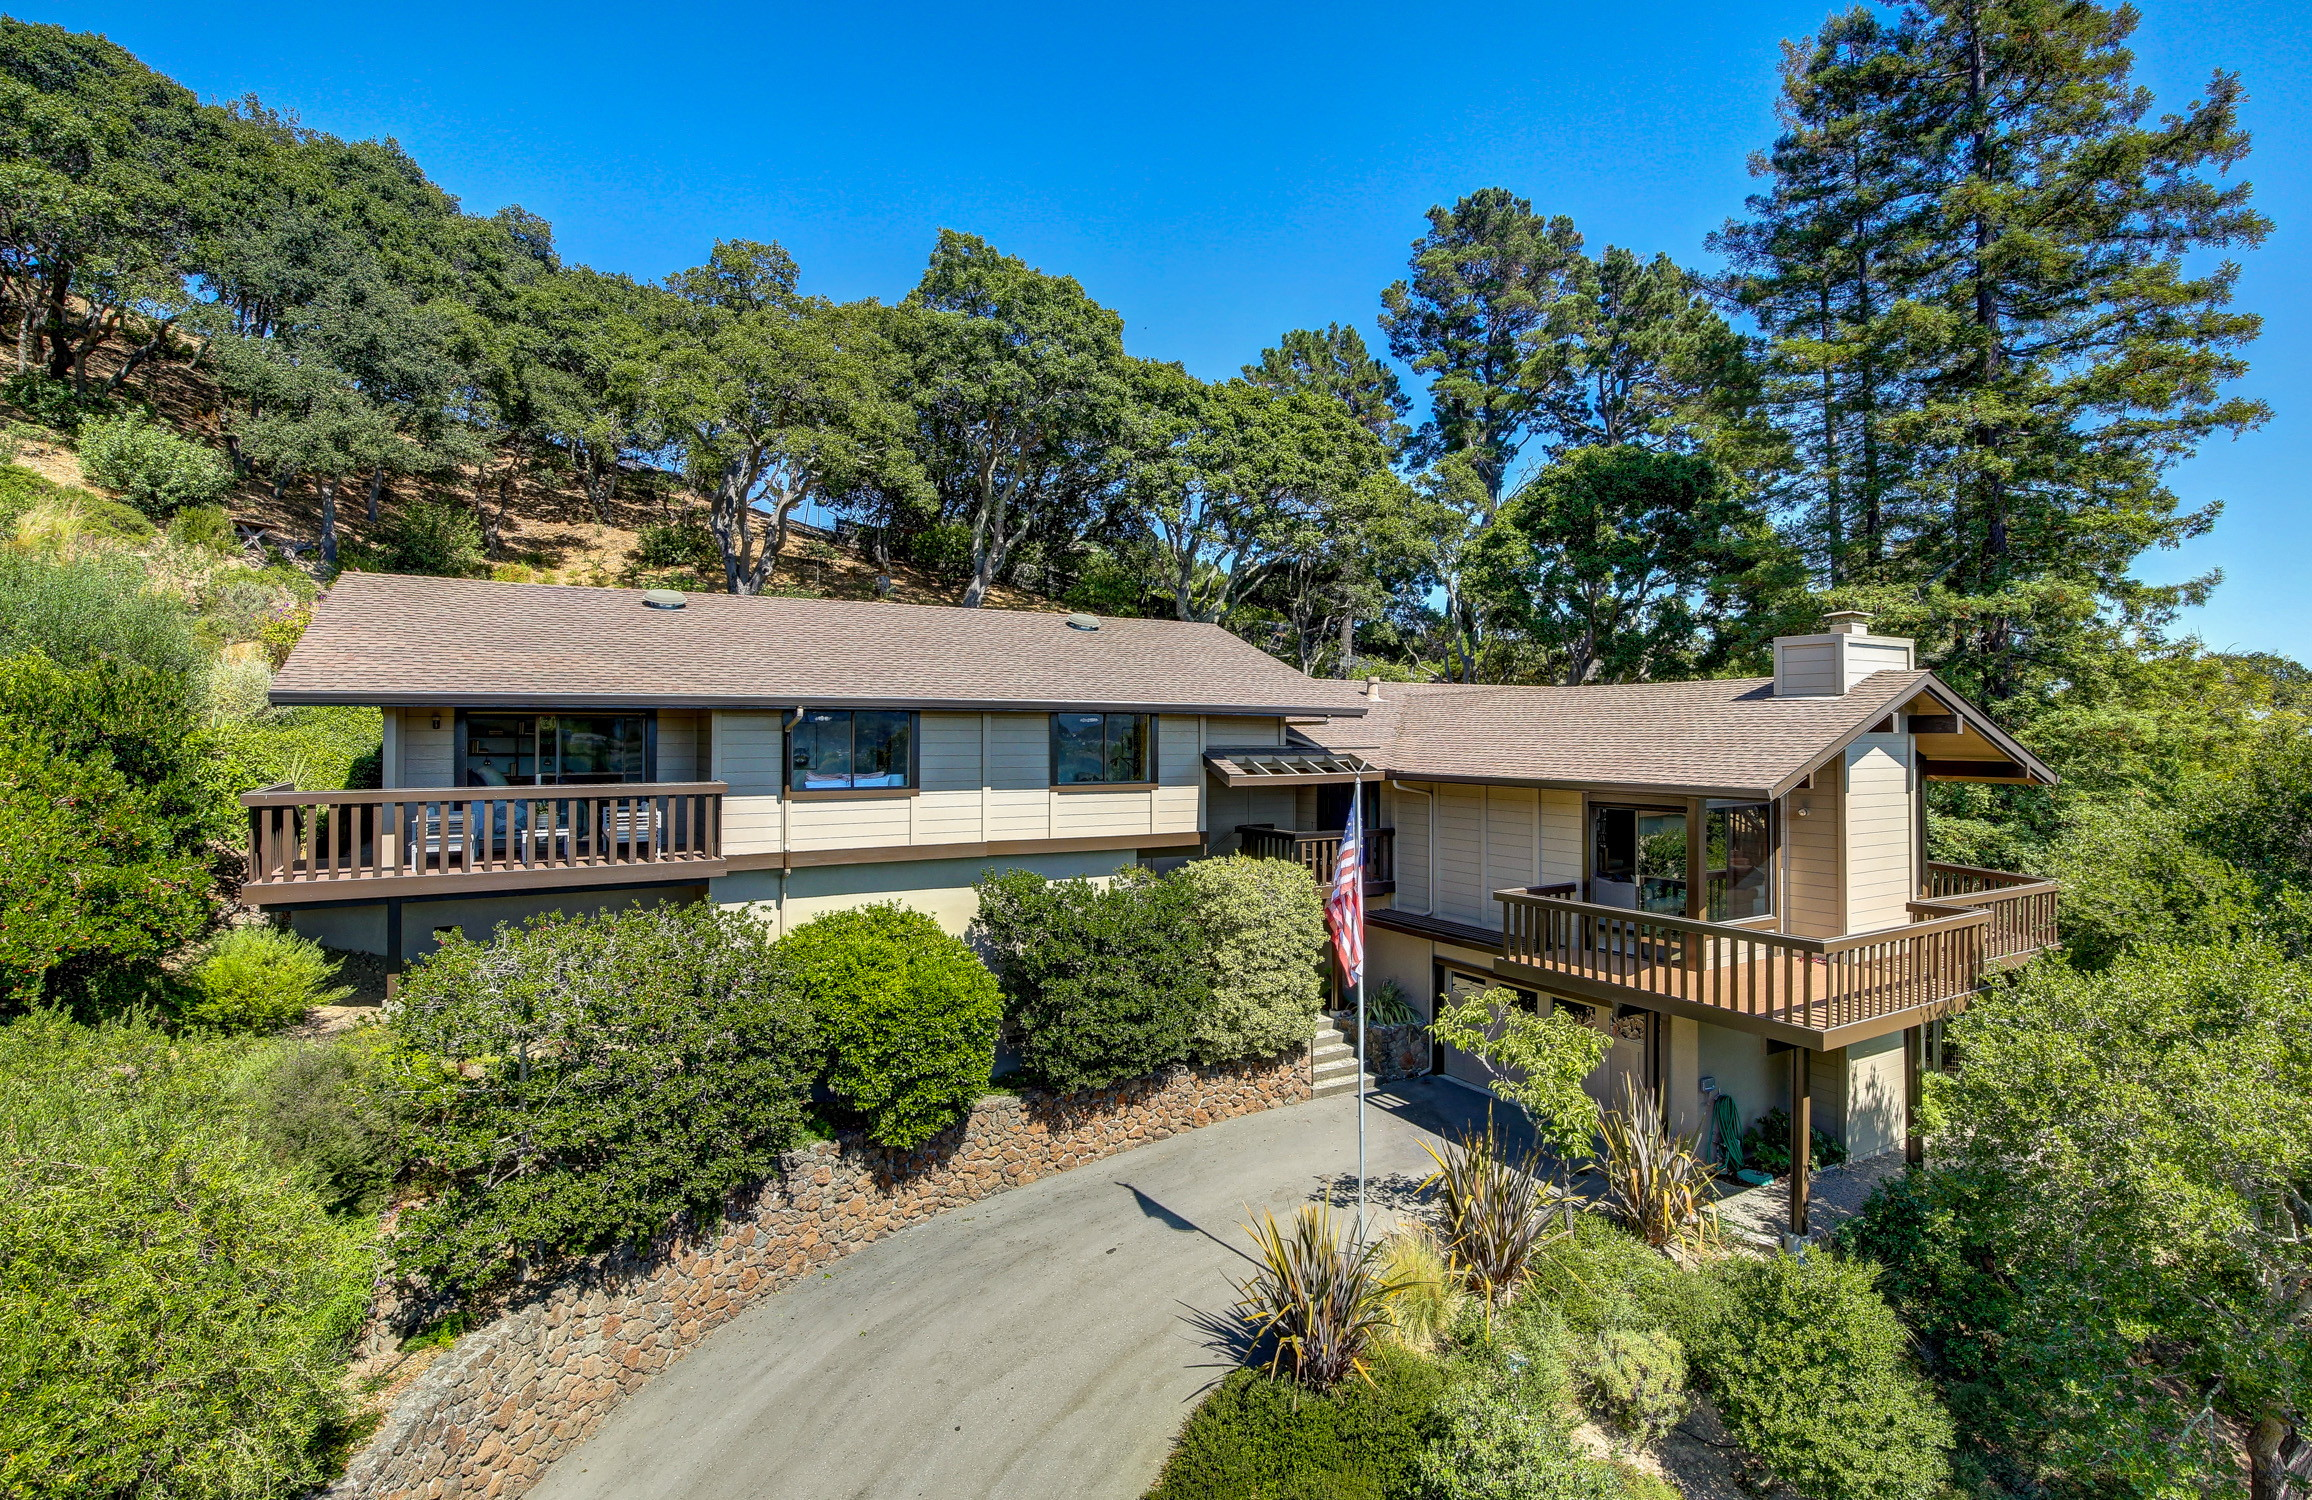 16Dorian 03 MLSSan Rafael Real Estate - Listed by Julia Fitzpatrick + Allie Fornesi Team Own Marin County .jpg